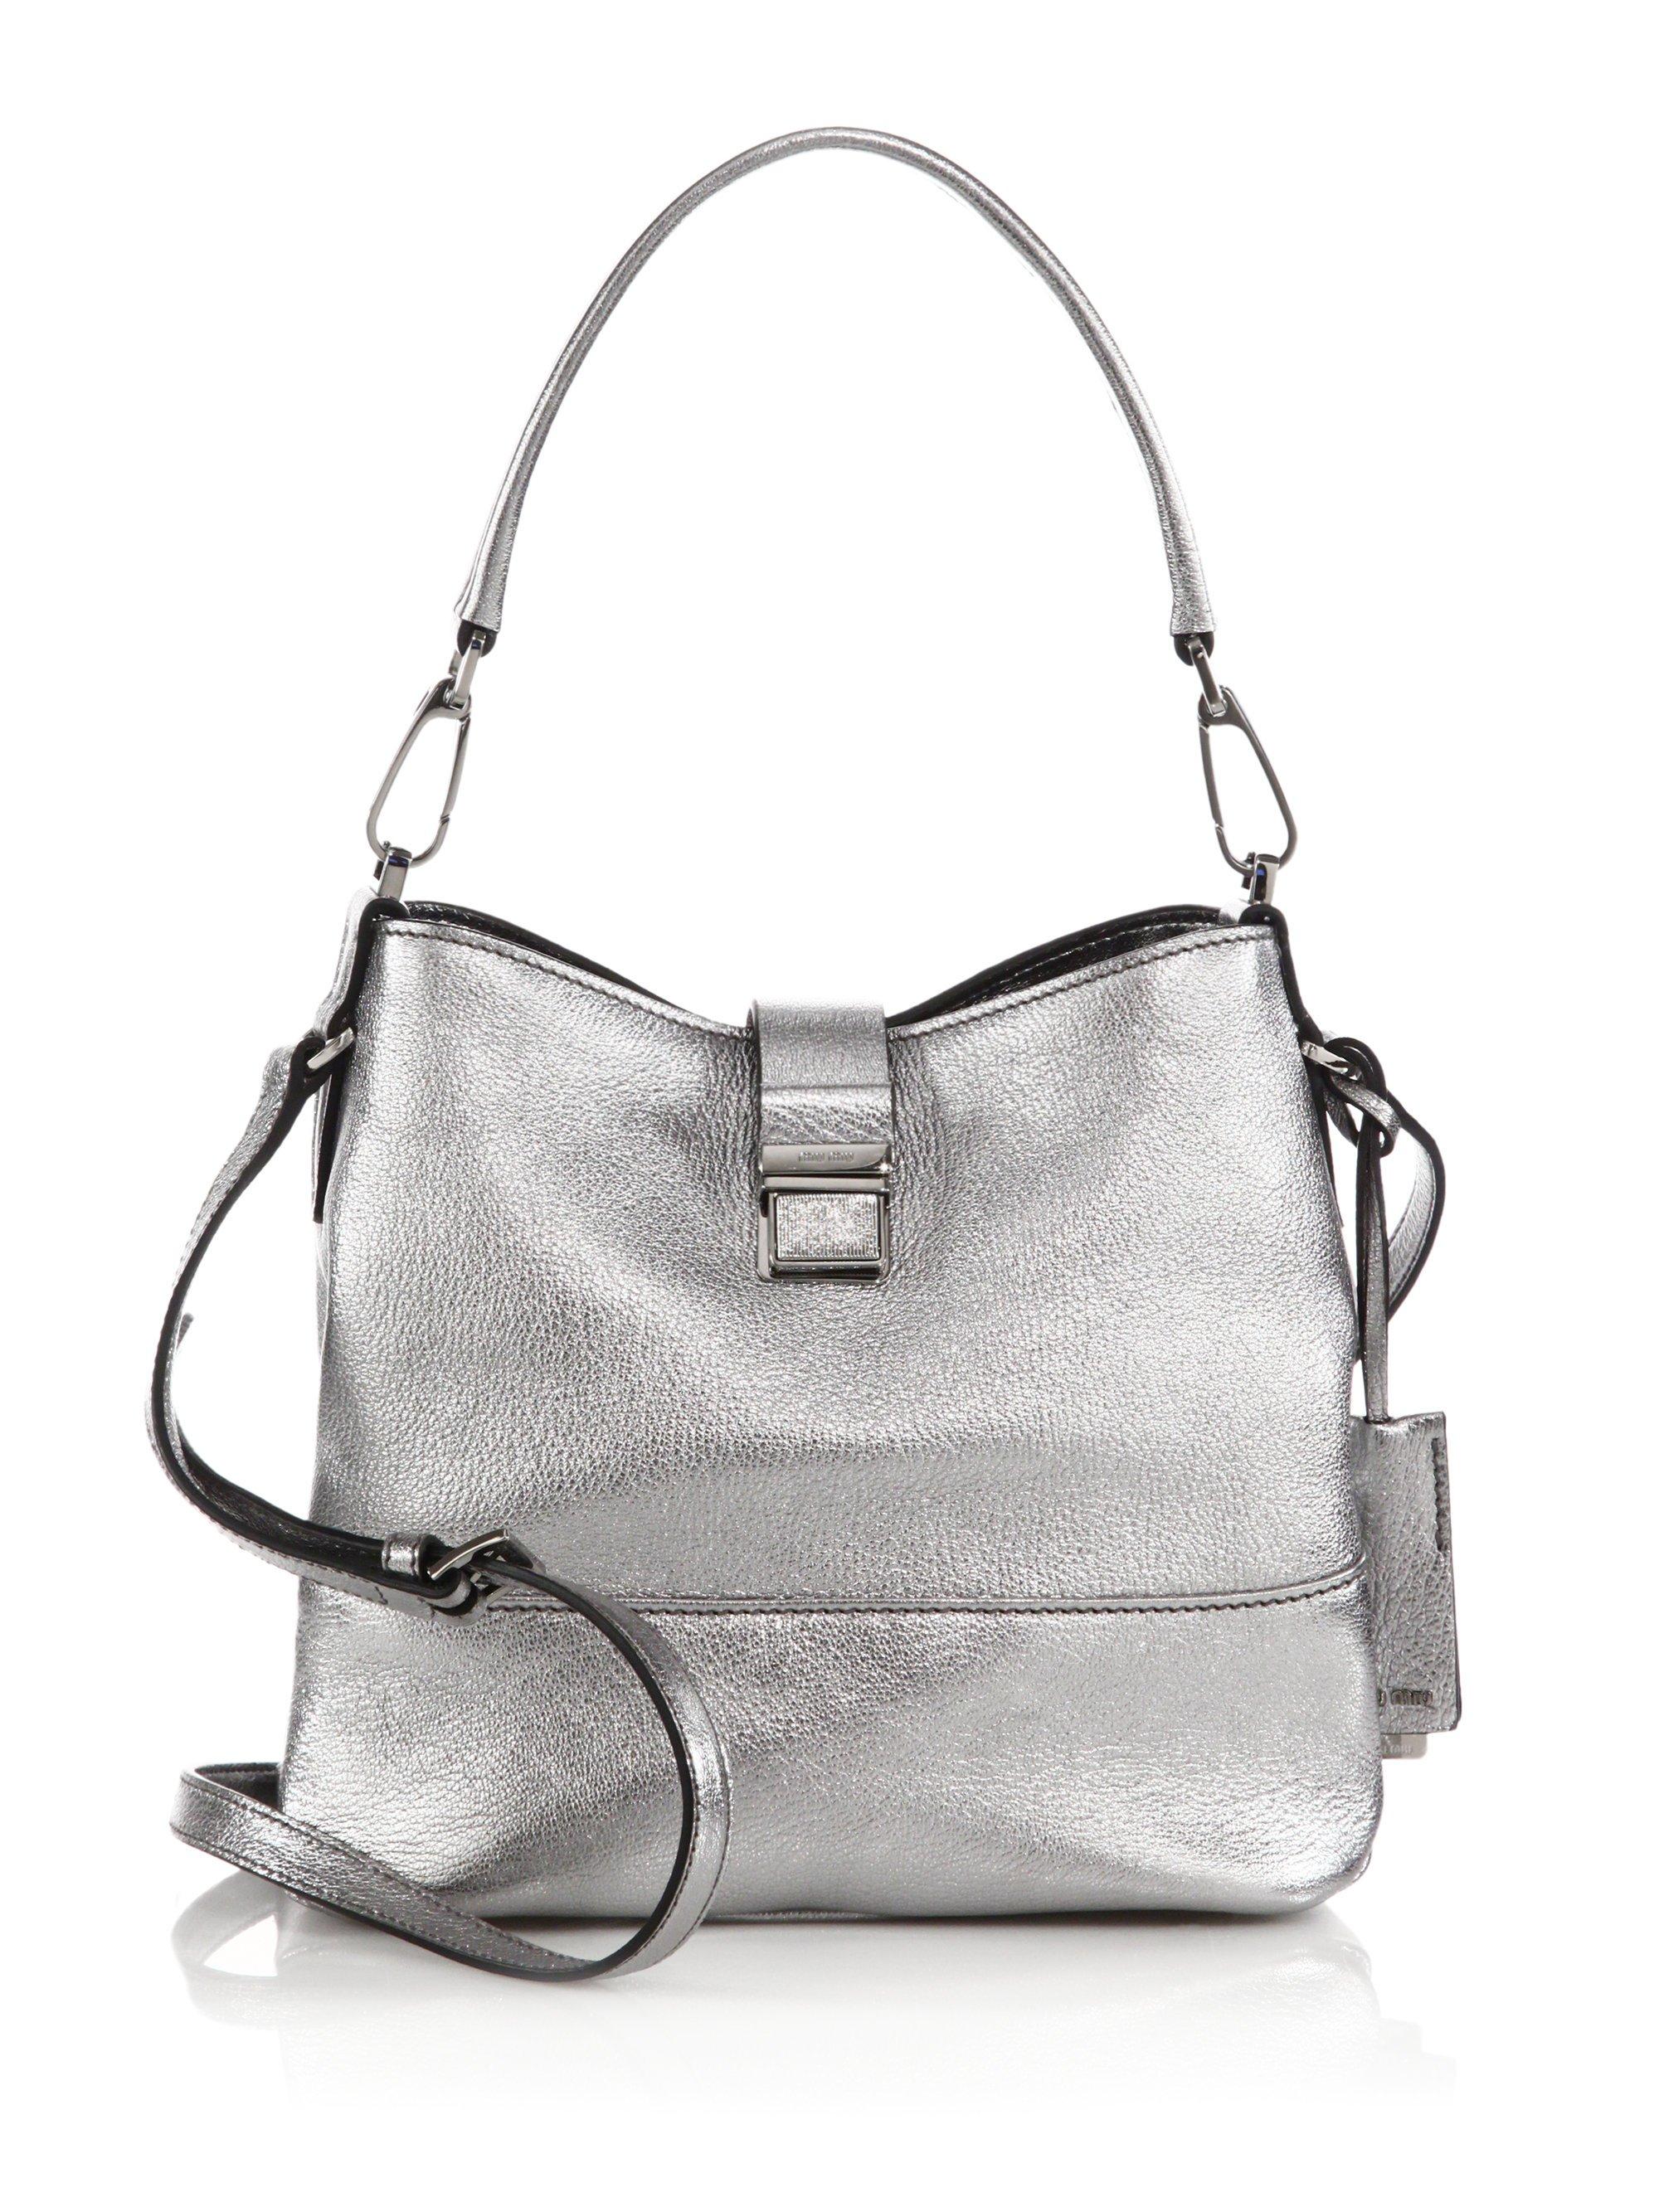 df1aab61eb150 Lyst - Miu Miu Madras Metallic Leather Crossbody Bag in Metallic